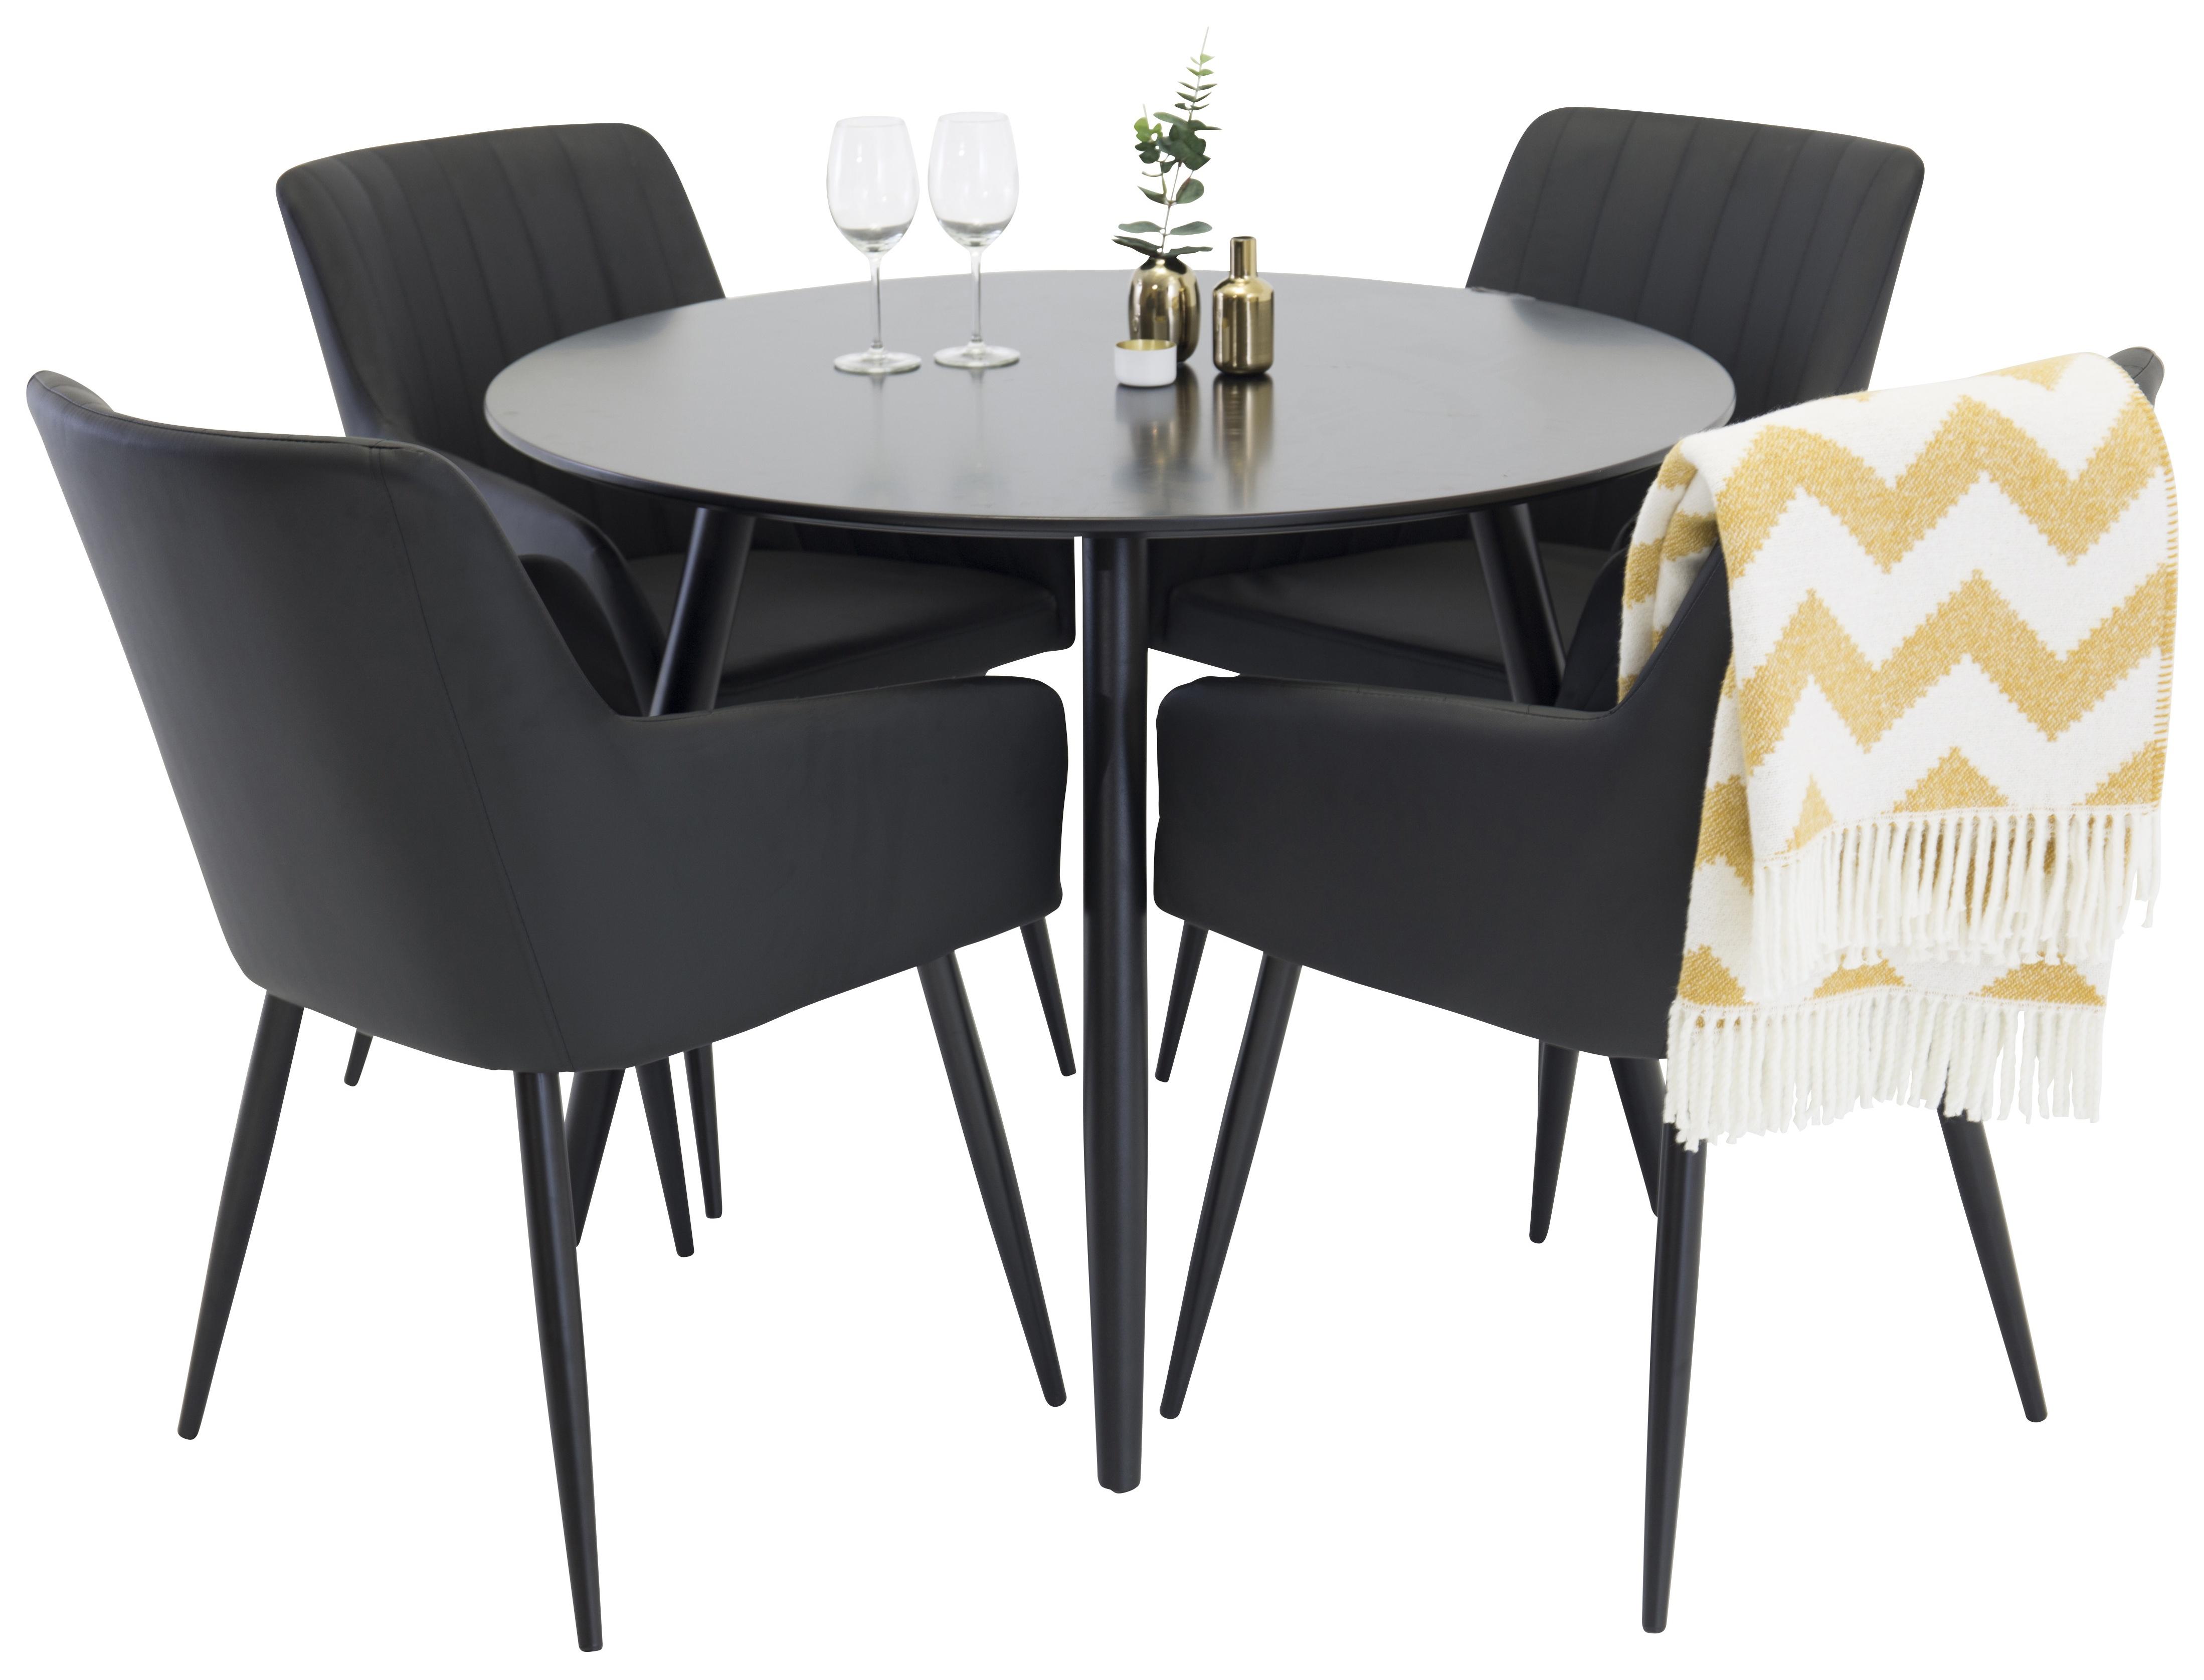 Plaza svart matbord 100 cm med 4 st stolar Comfort svart